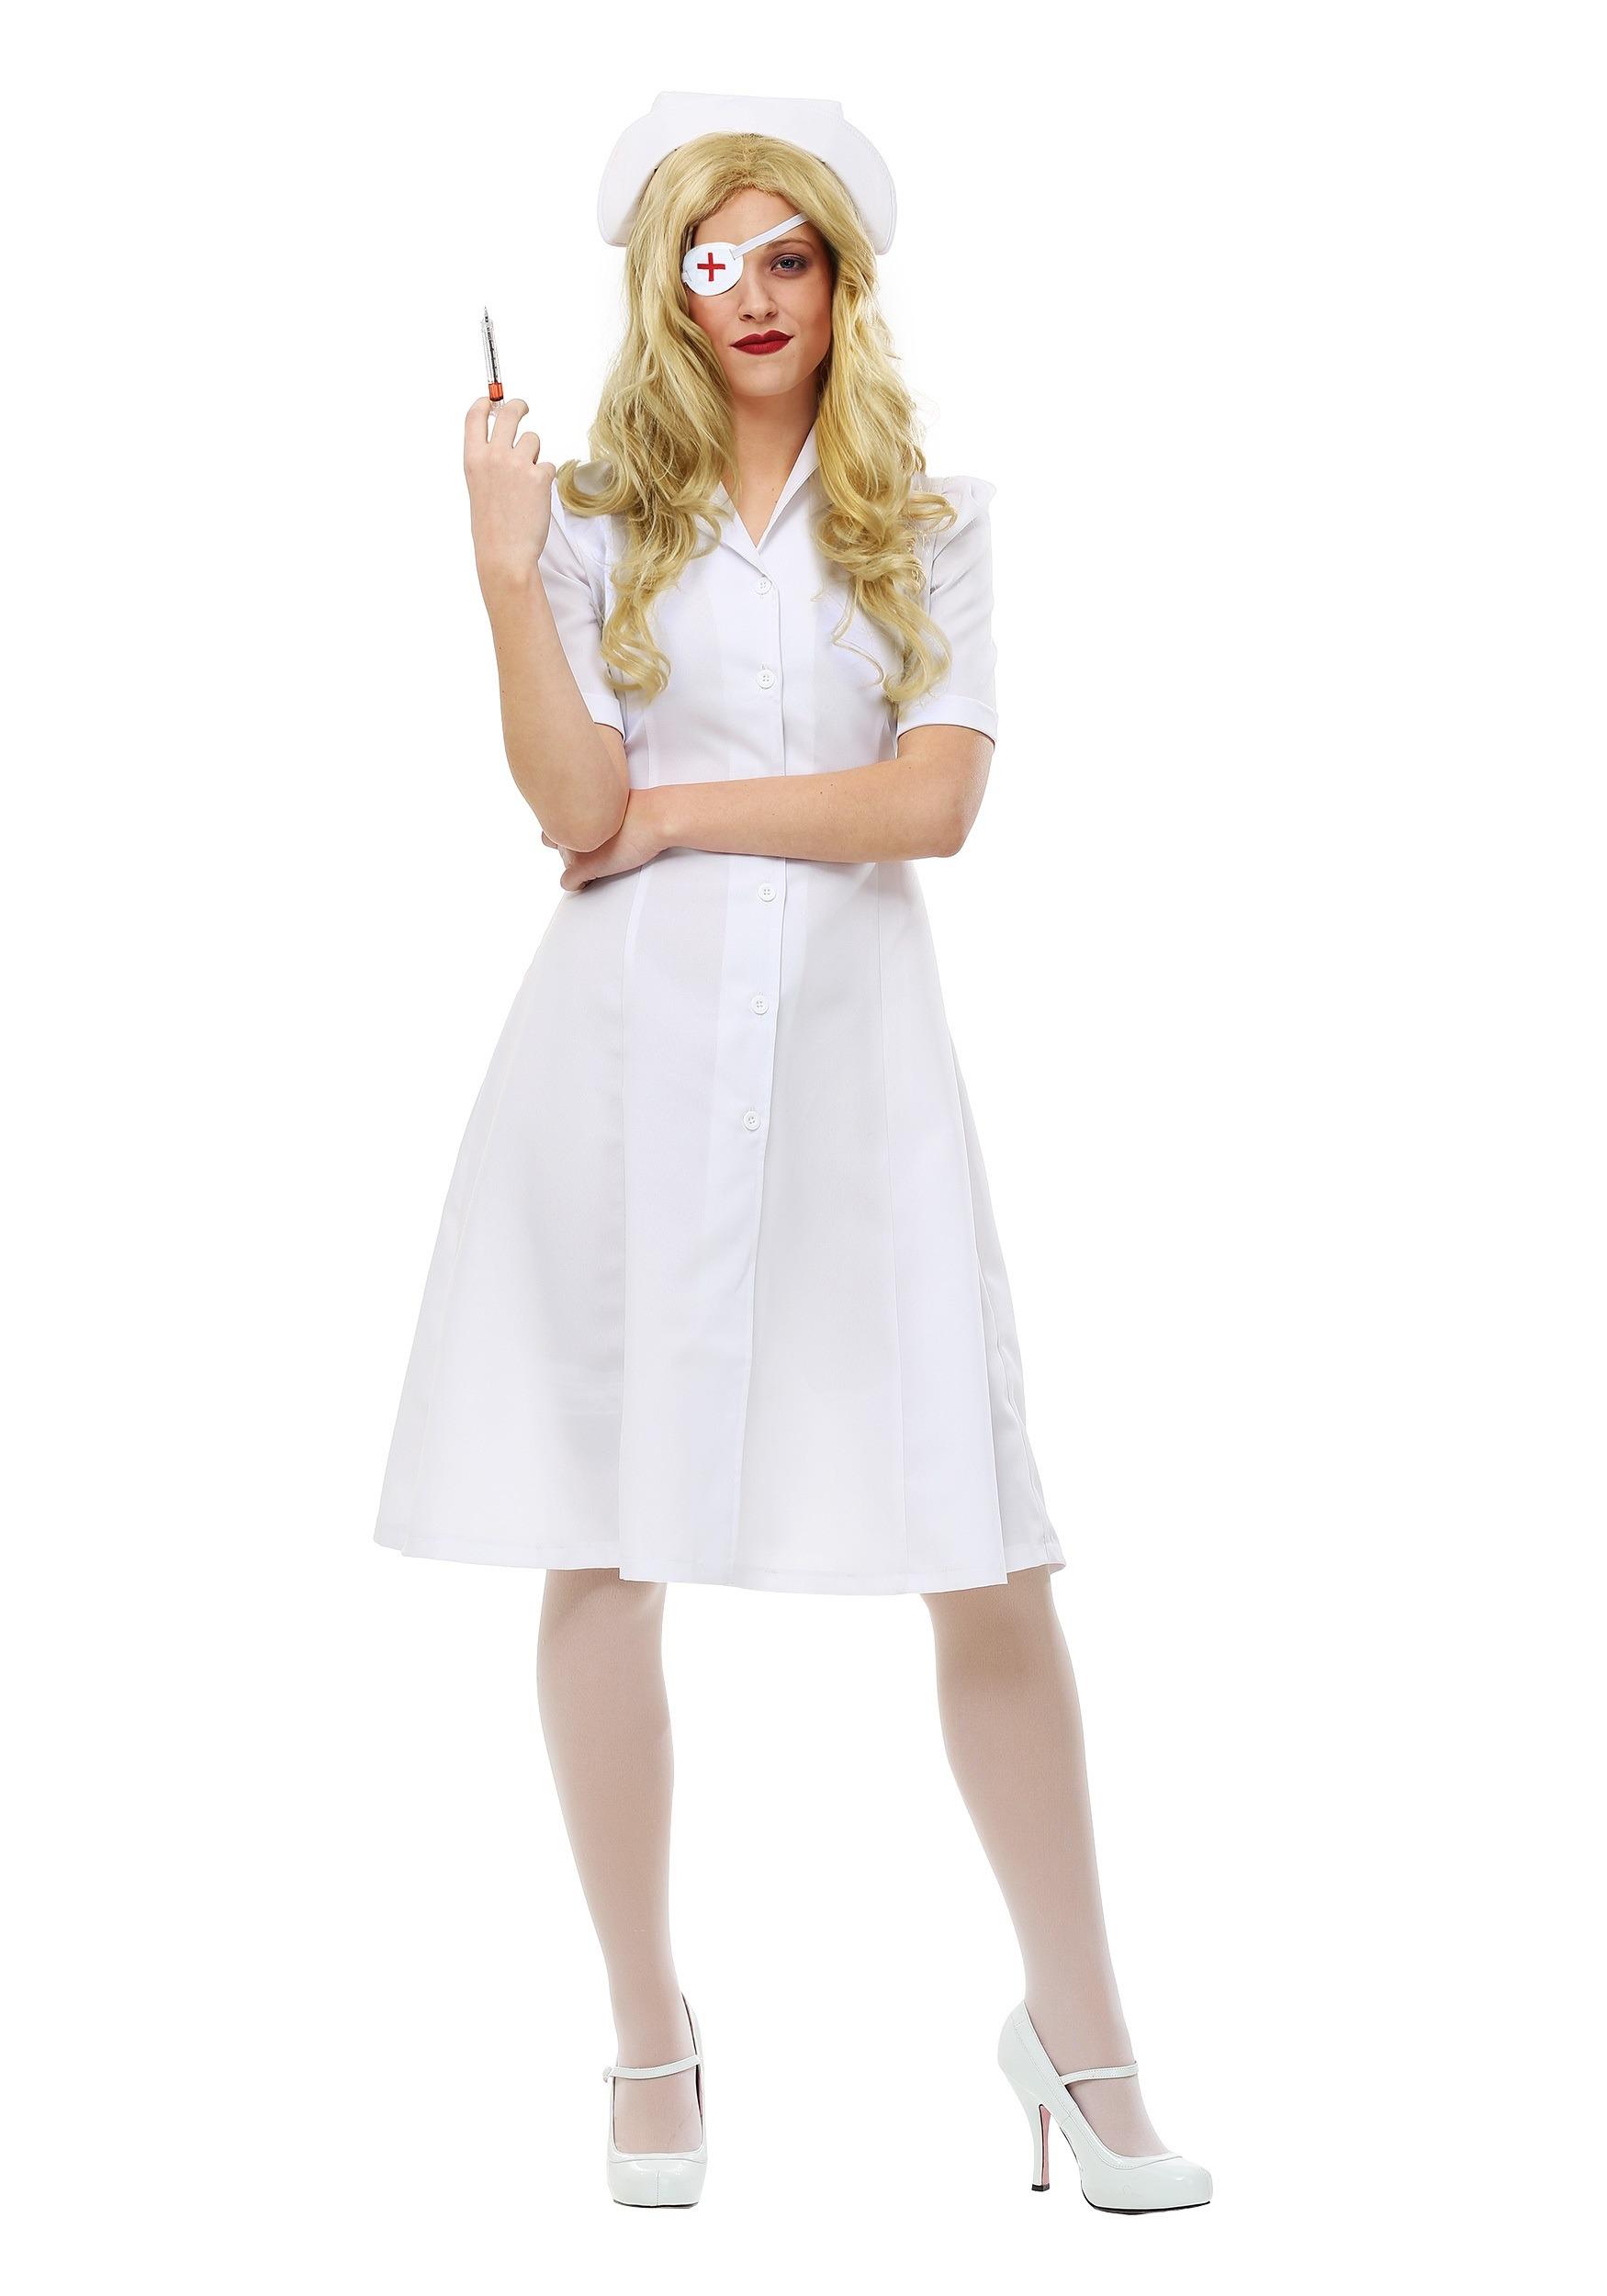 Elle Driver Nurse Costume from Kill Bill